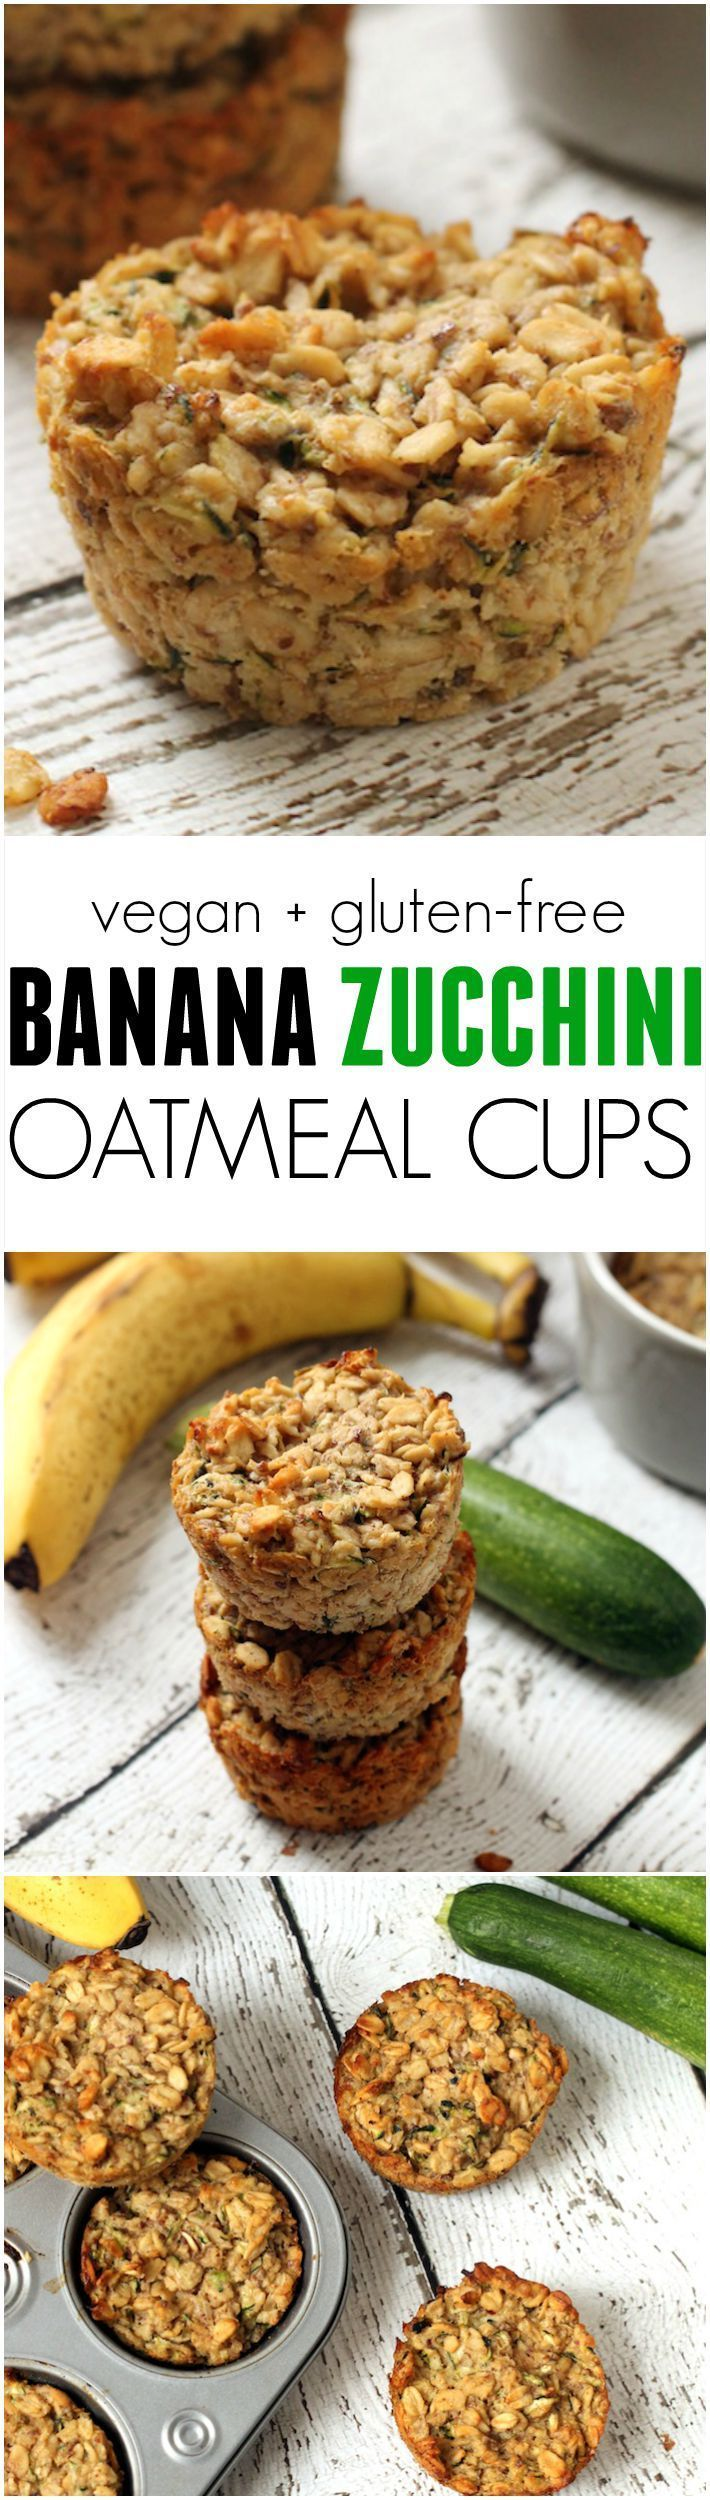 Banana Zucchini Oatmeal Cups --a portable, easy, healthy, breakfast on-the-go! Vegan, gluten-free, kid-friendly, no refined sugar. http://Hummusapien.com